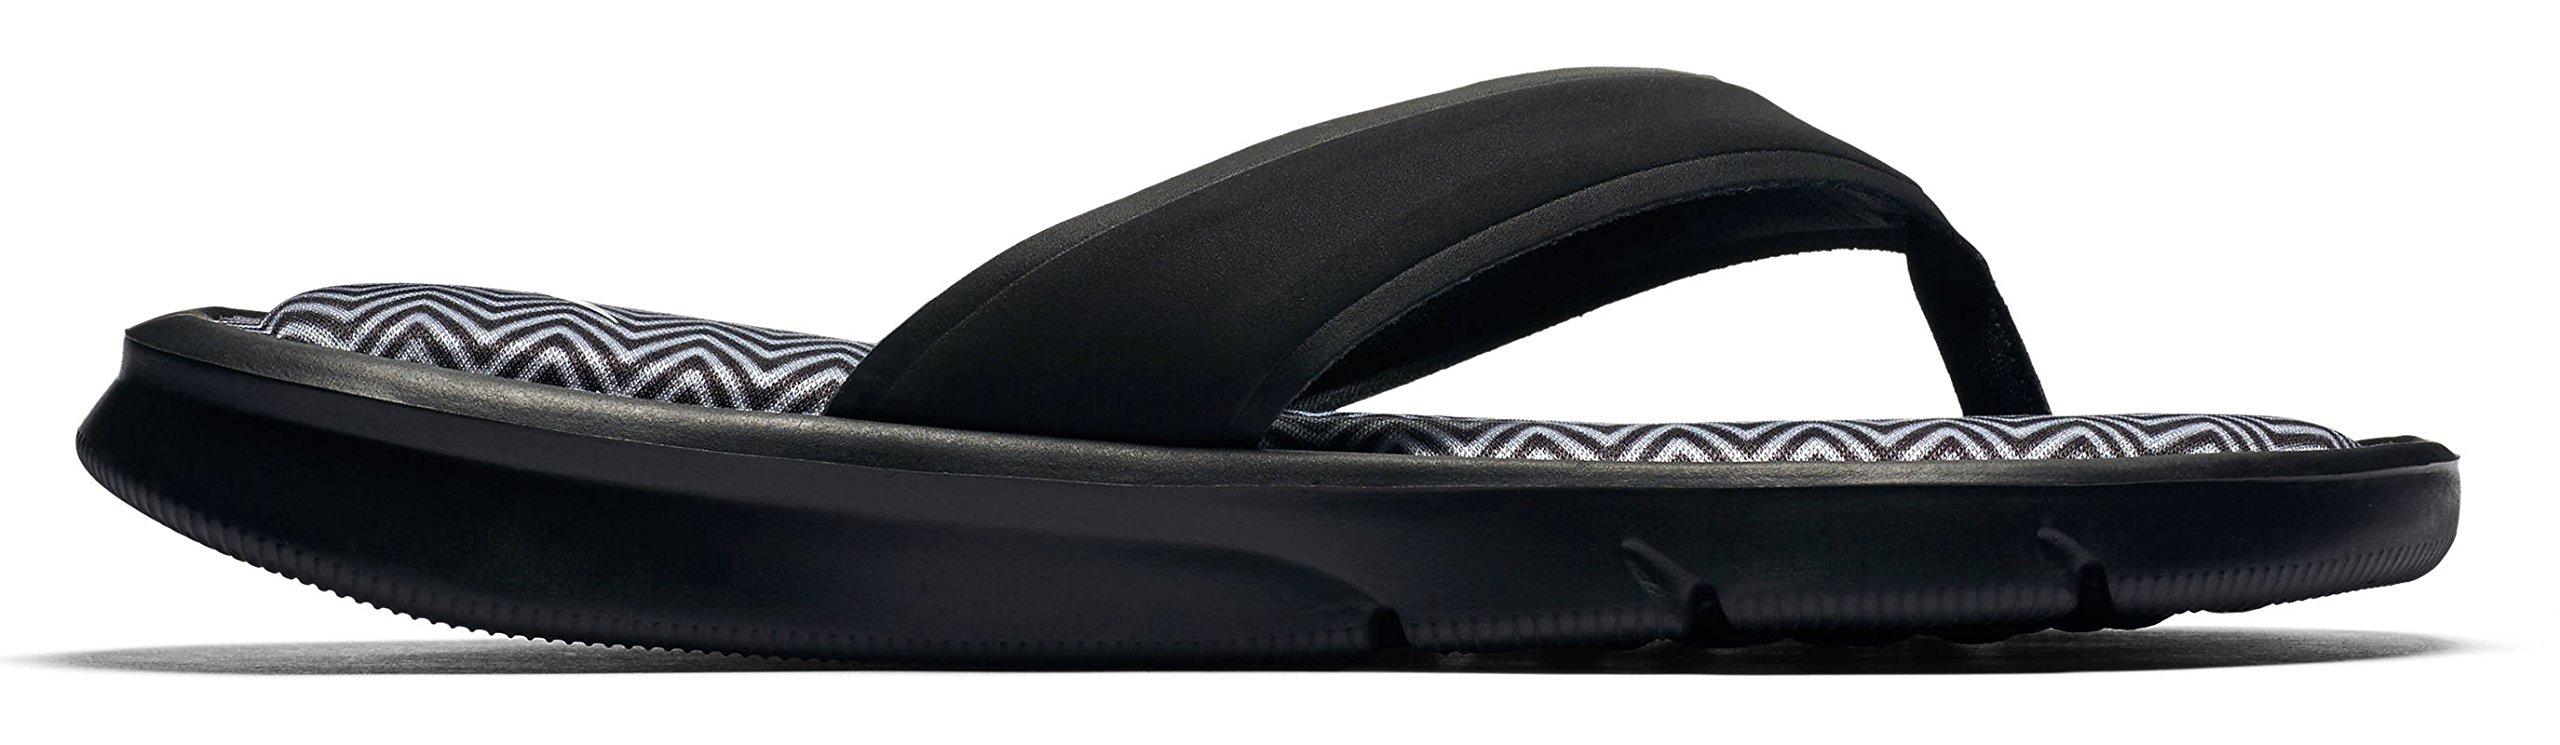 NIKE Ultra Comfort Thong Print Womens Style : 882700 Womens 882700-001 Size 12